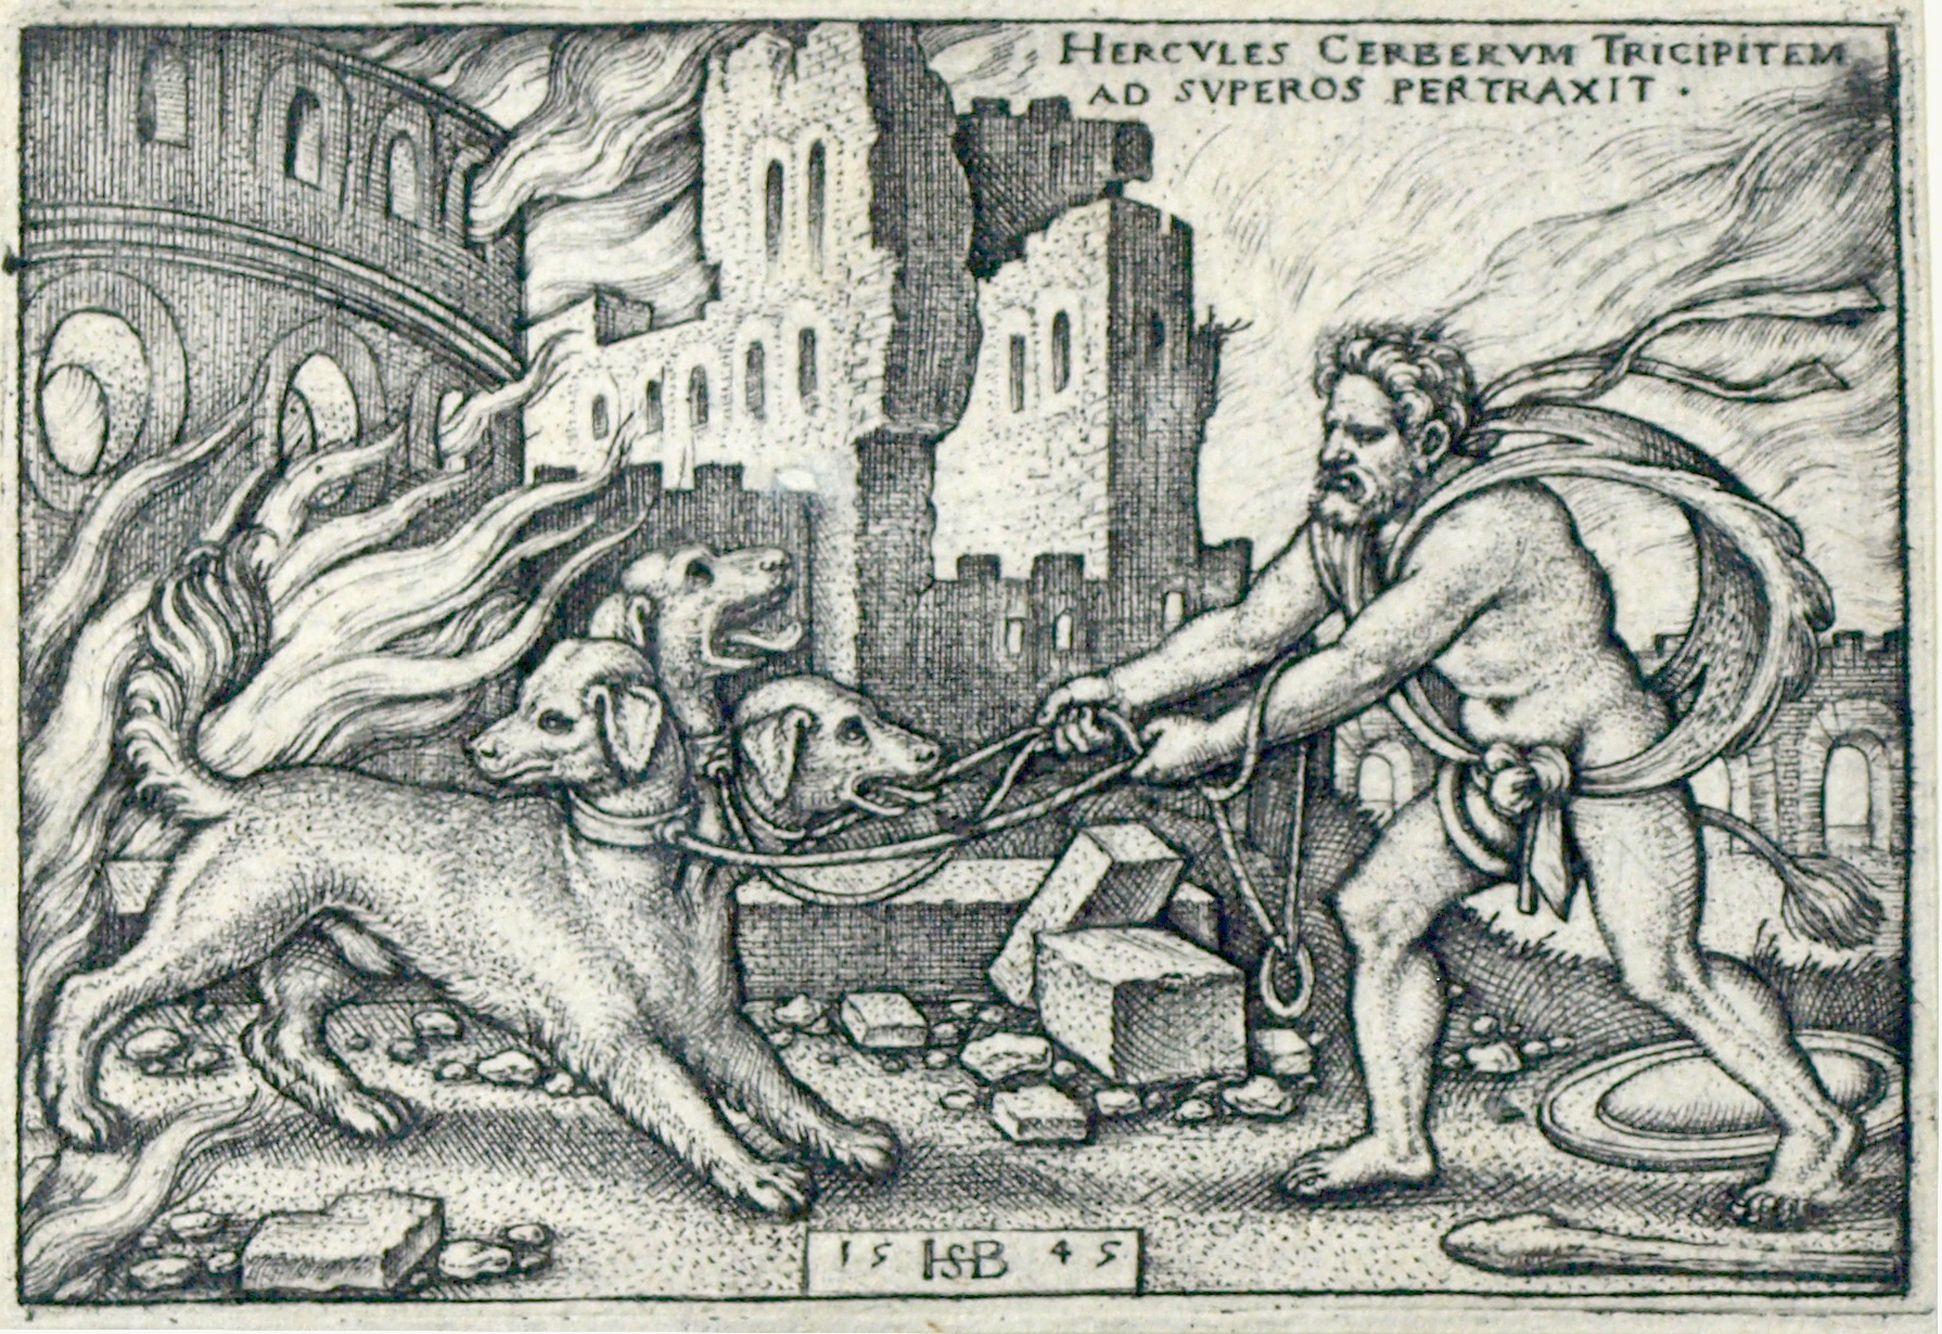 Die Taten des Hercules Hercules hat den dreiköpfigen Cerberus in die Oberwelt geschleppt, 1545, 52 x 77 mm